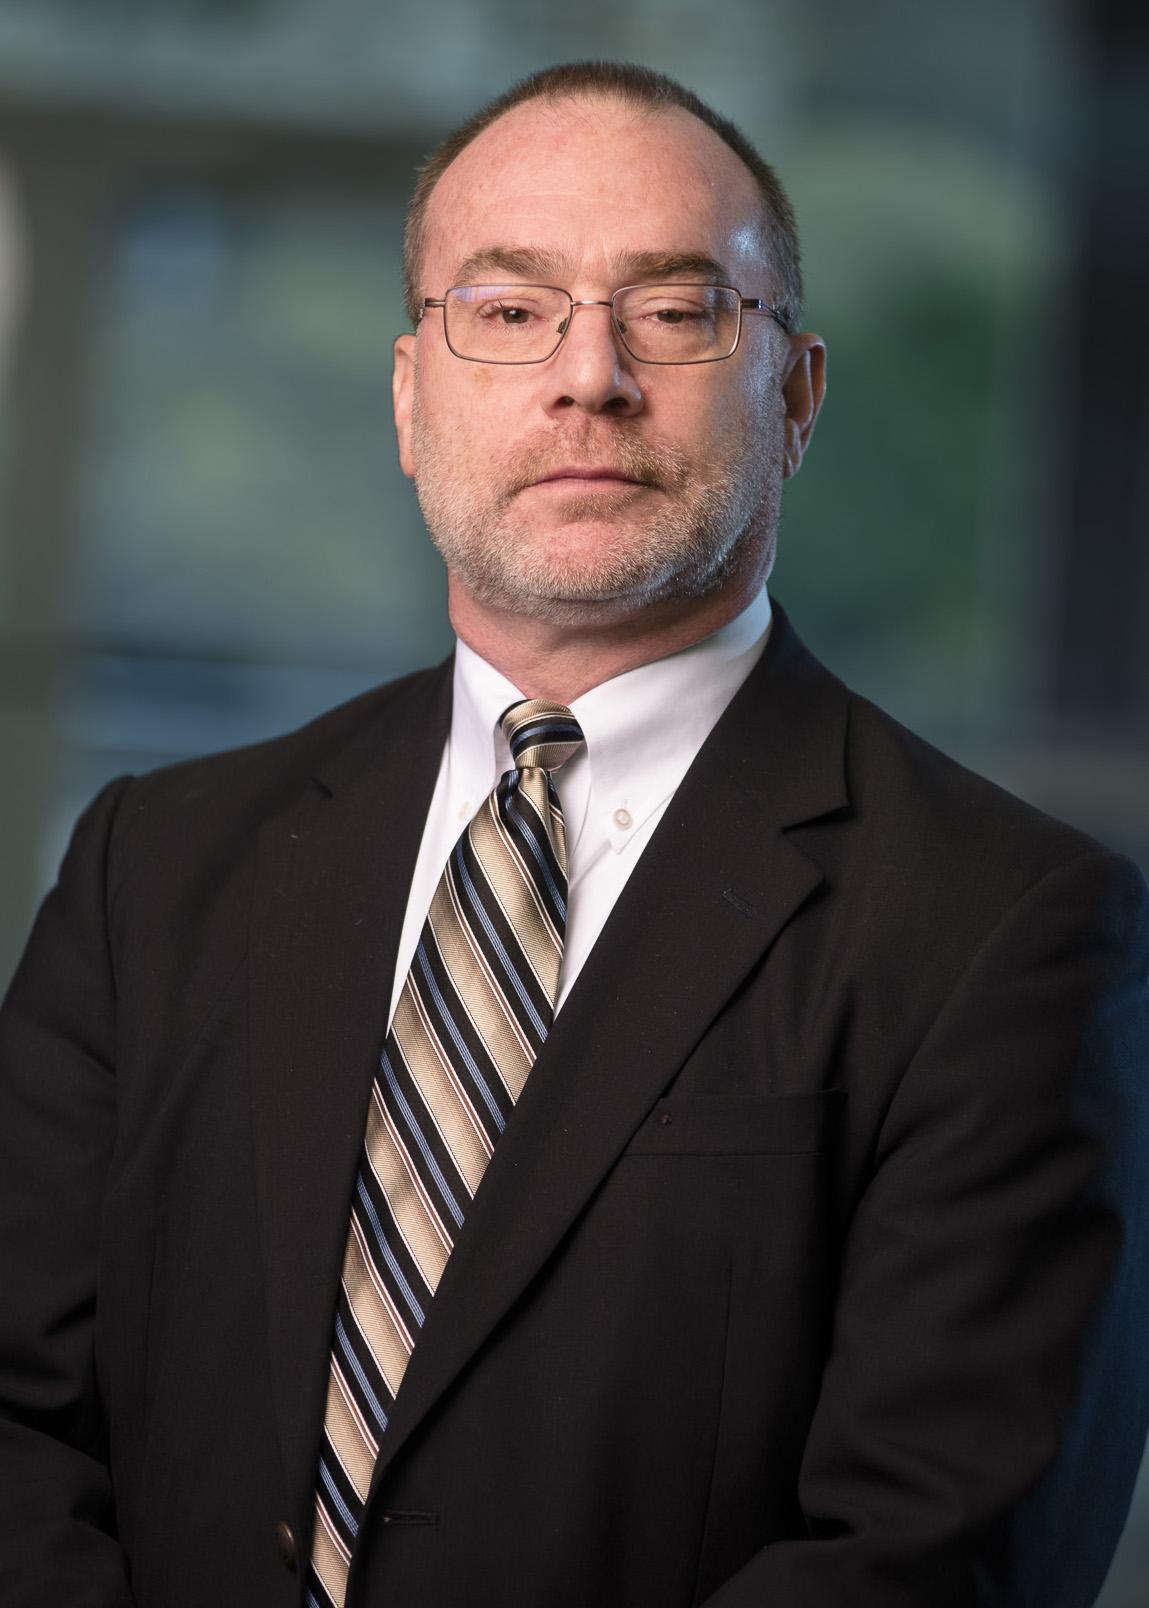 Jack Dorminey Ph.D.